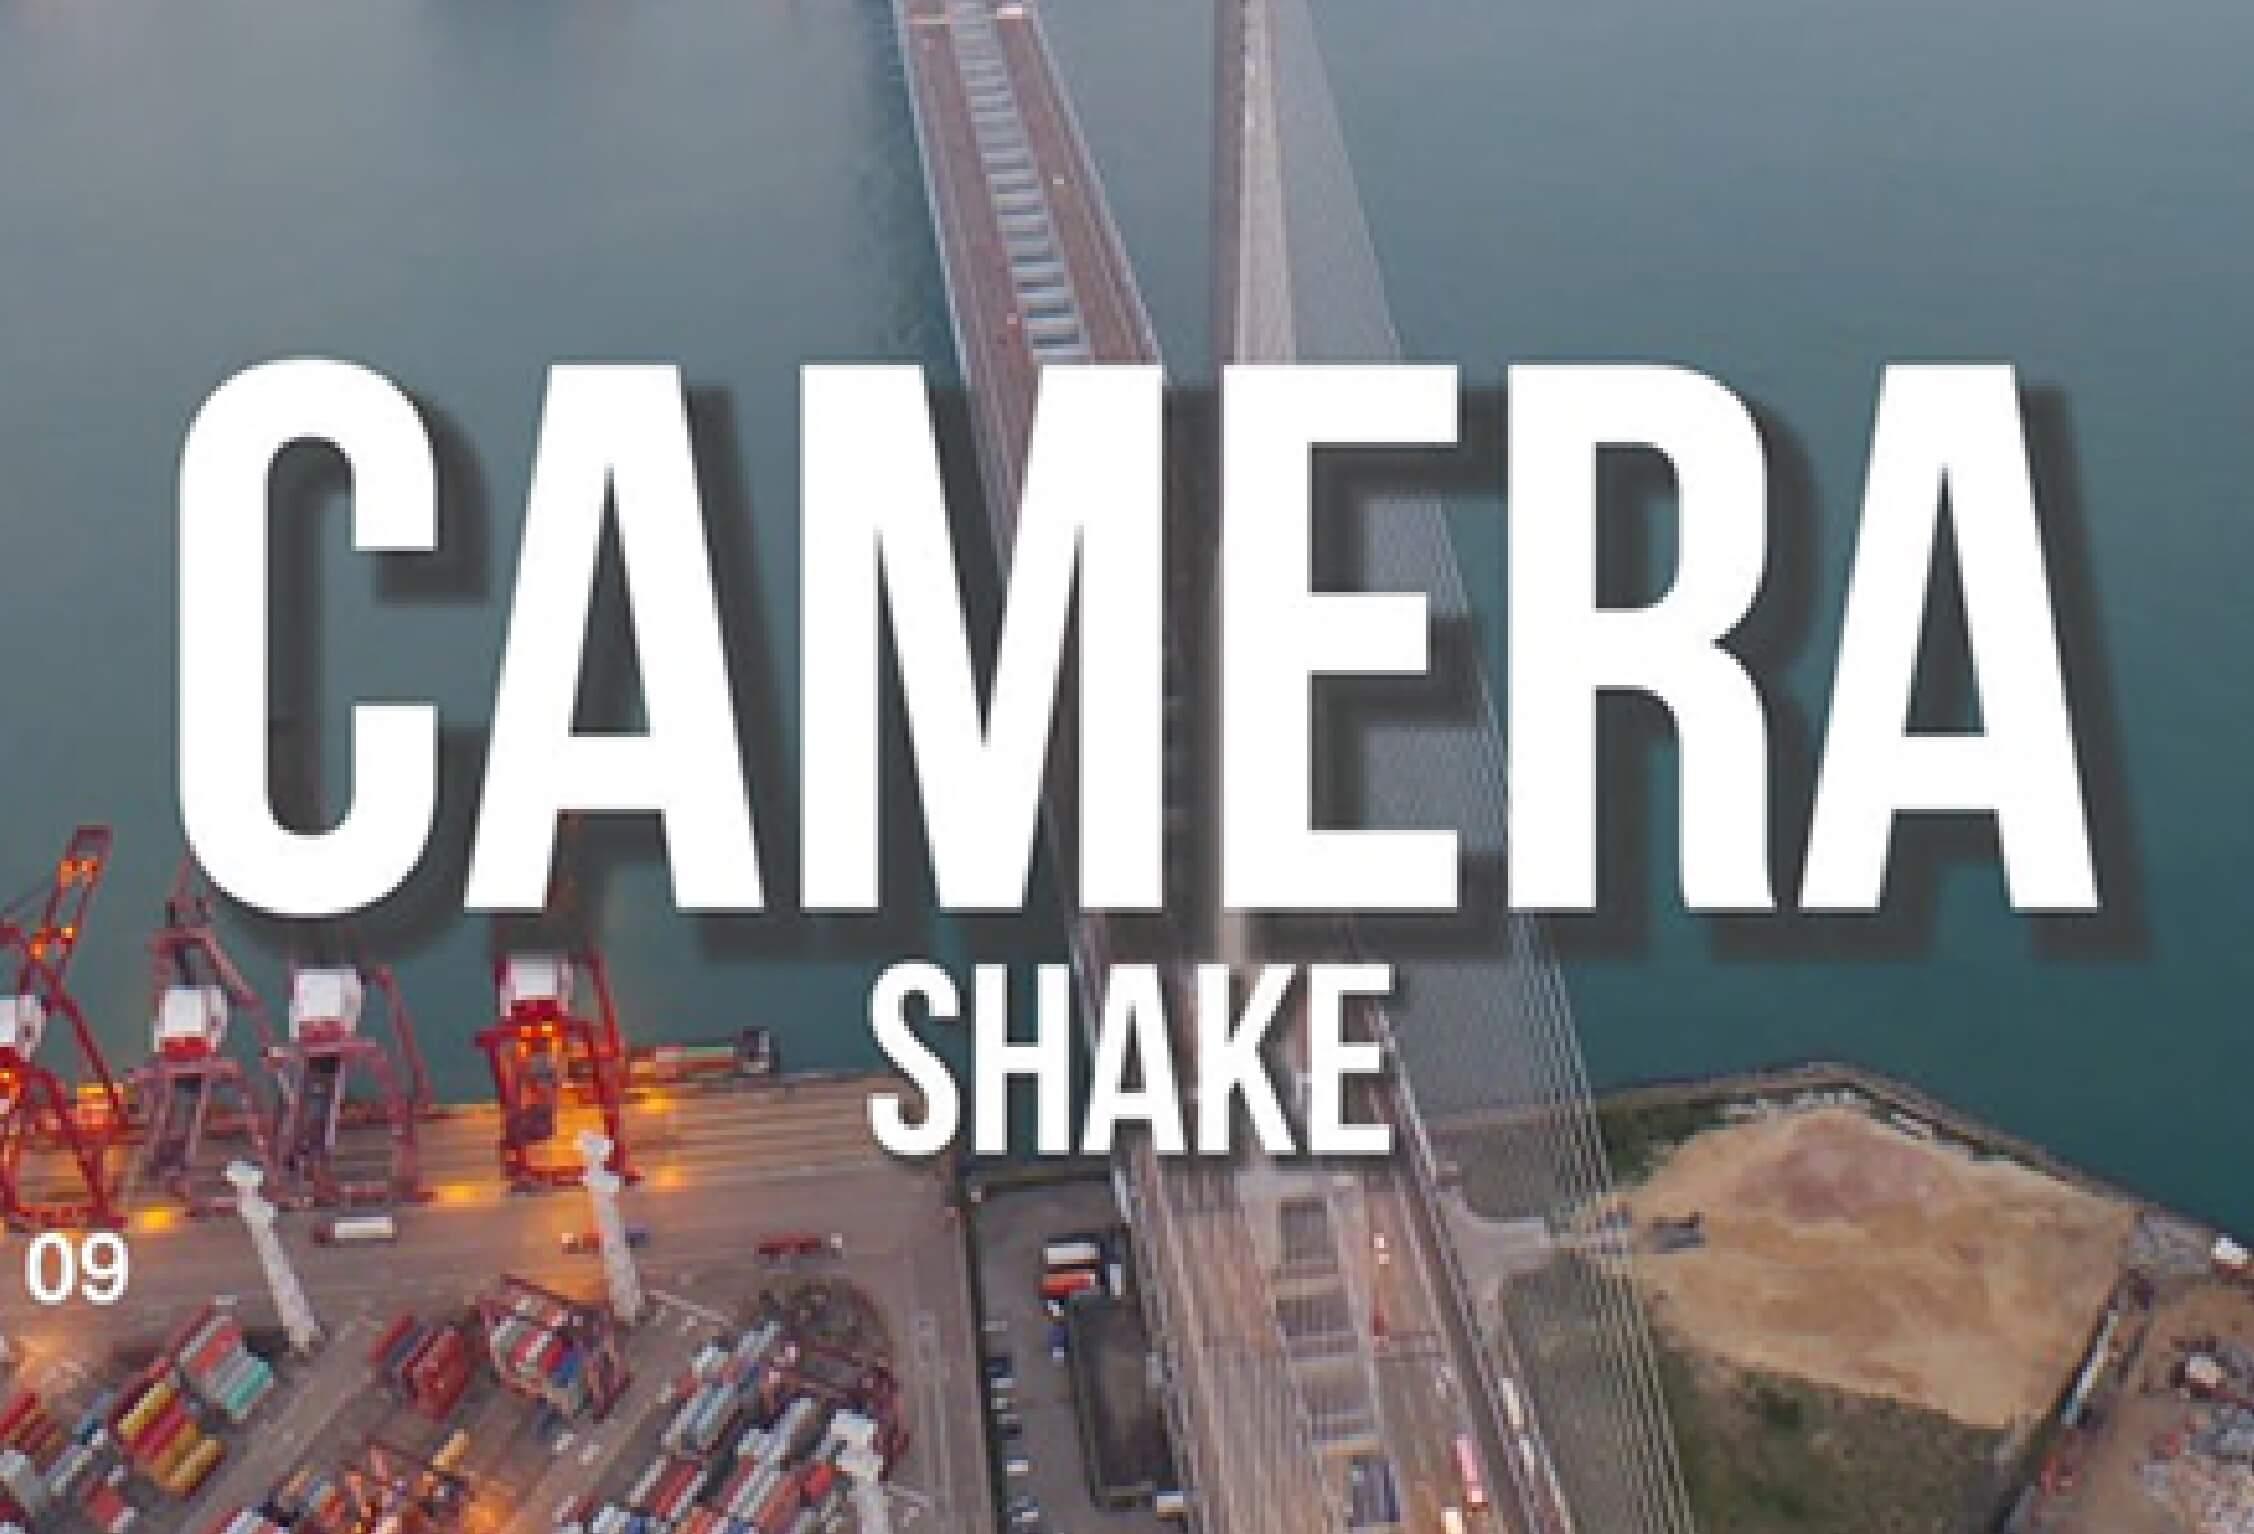 fcpx插件 10种模拟相机平滑晃动效果预设 Smooth Camera Shake